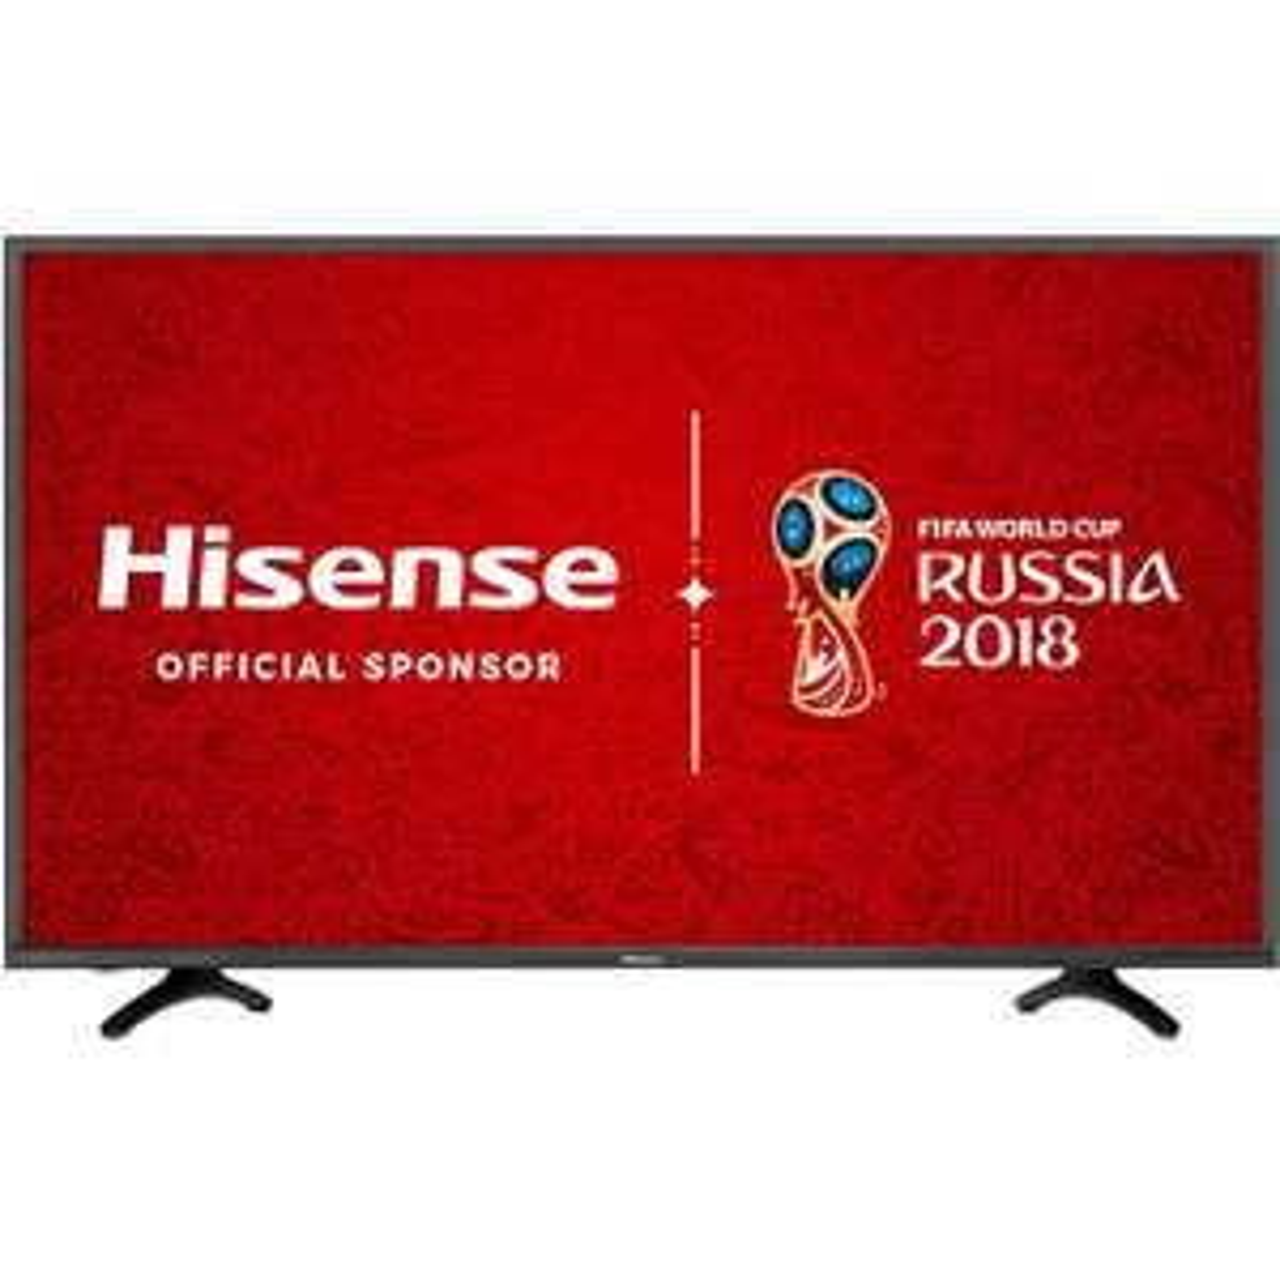 "Hisense H55N5500 55"" Smart 4K £469 @ ao.com with code"